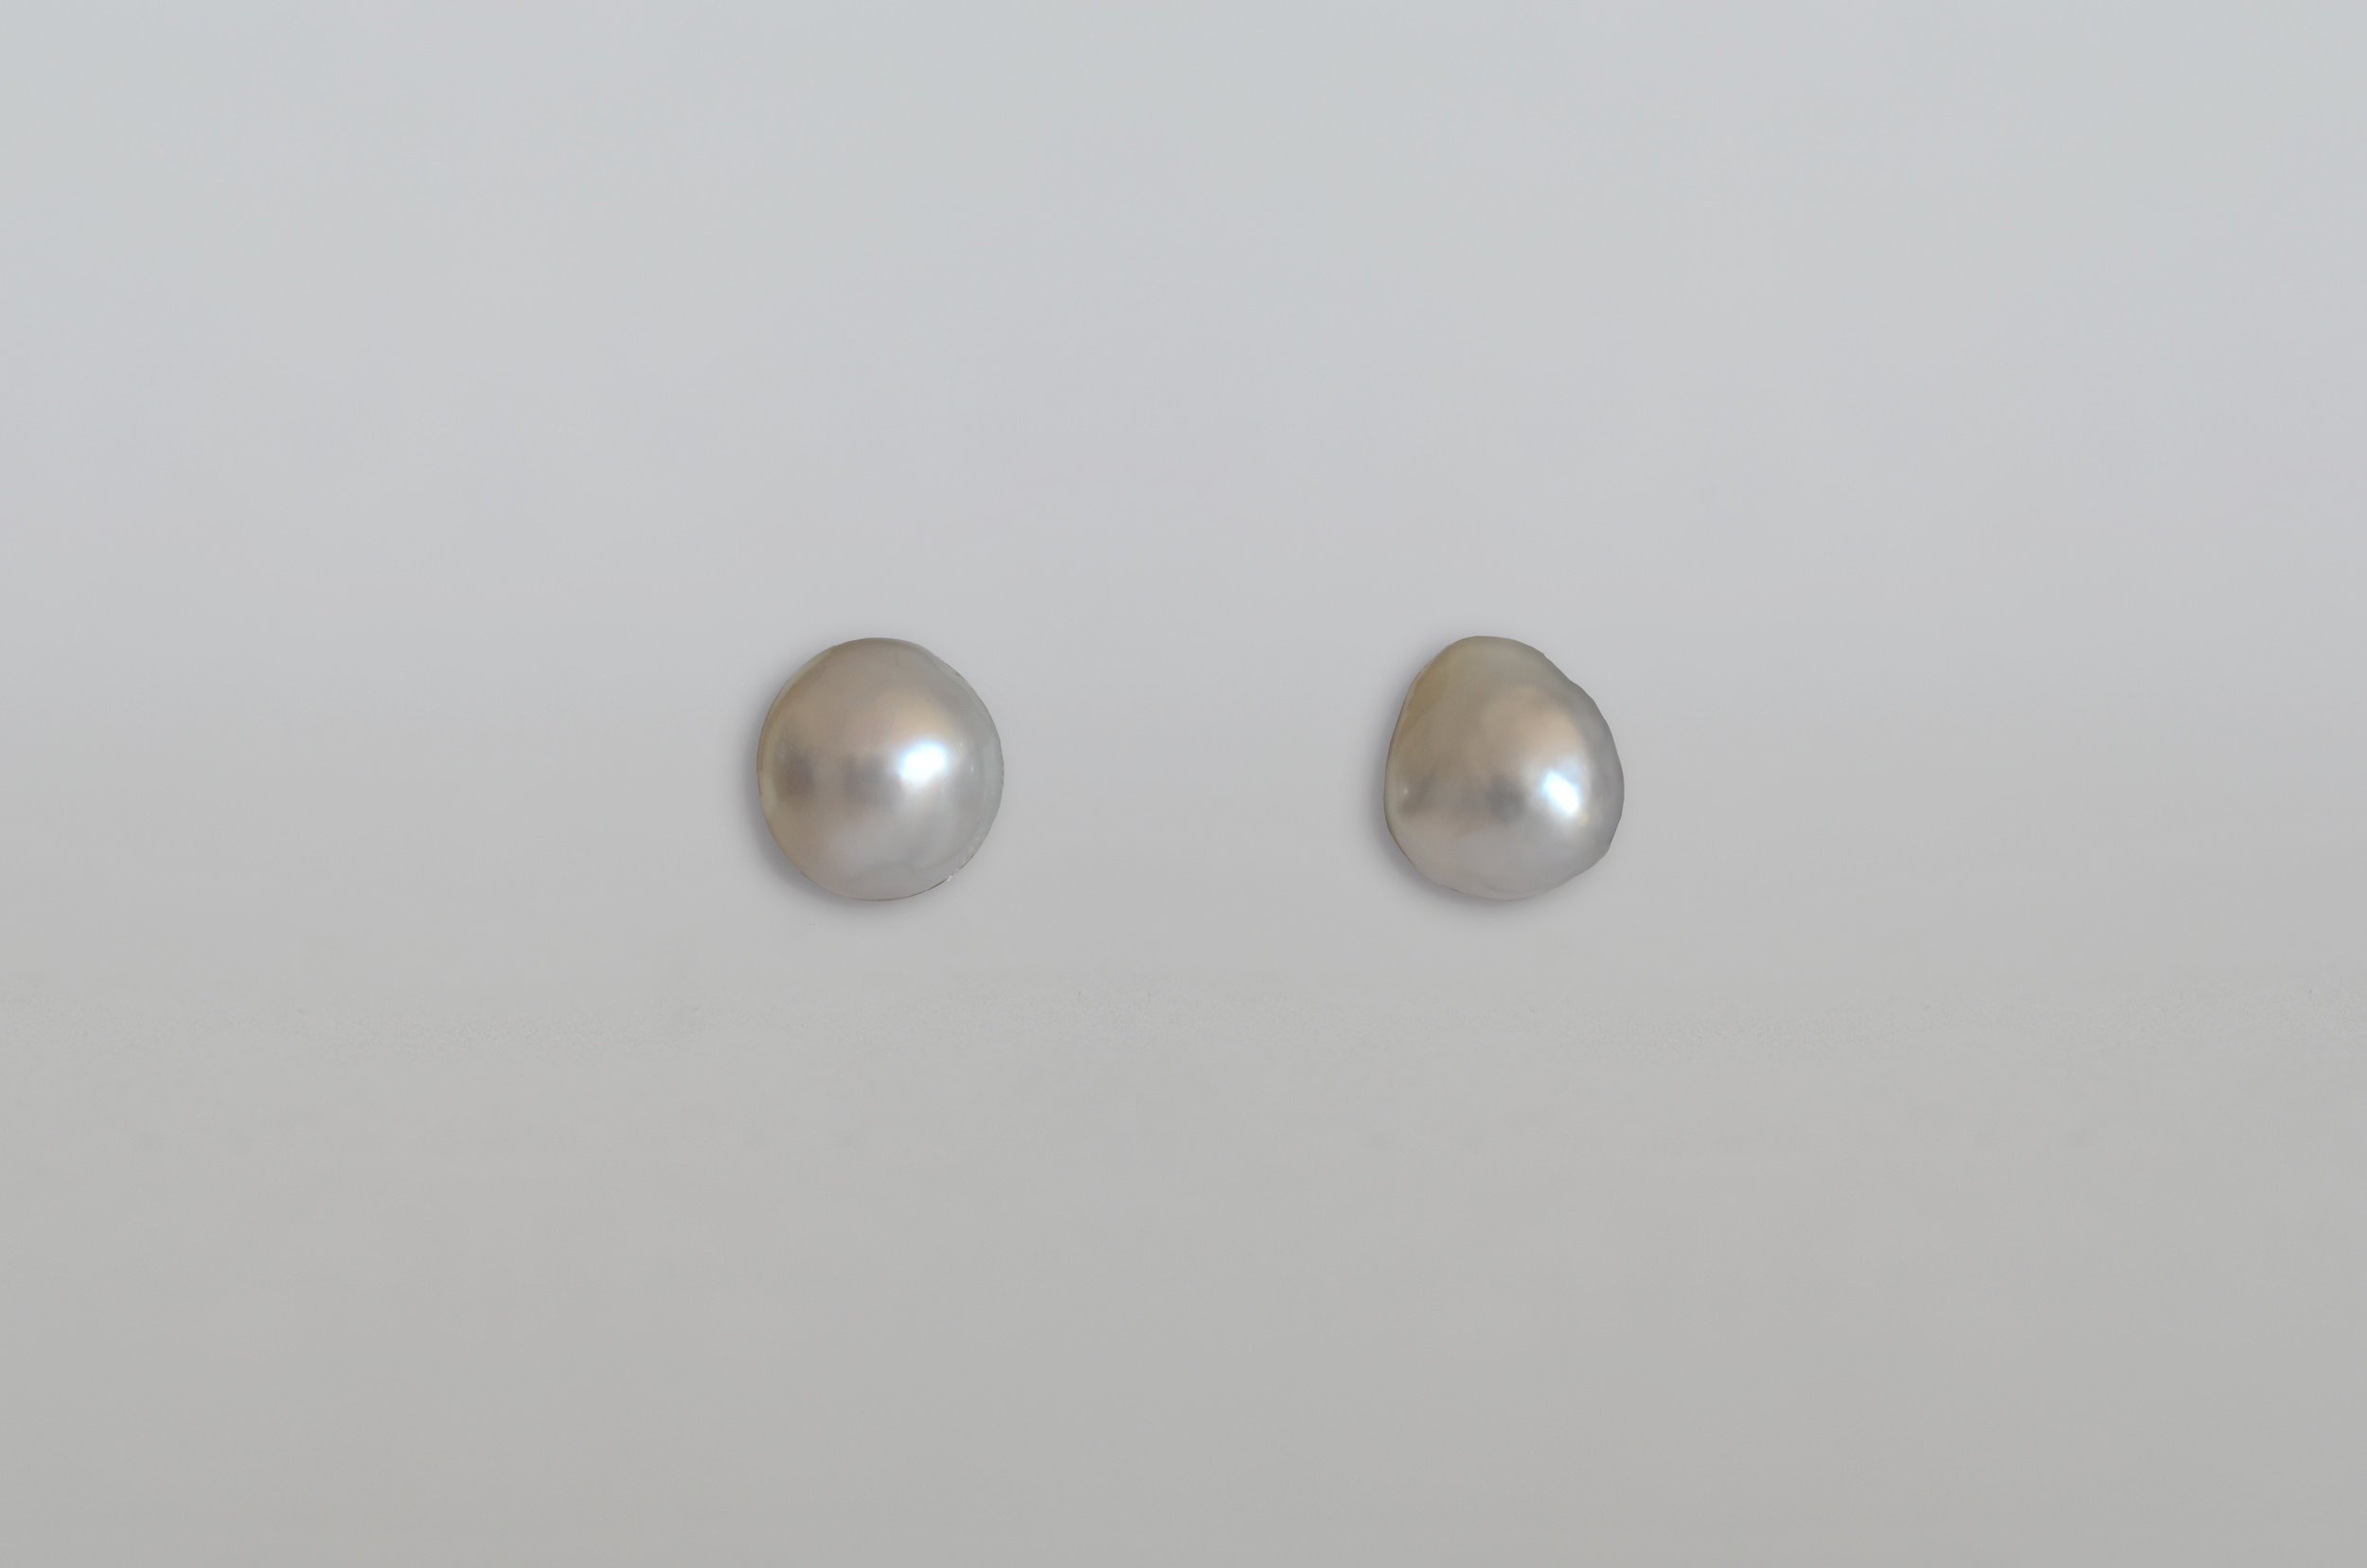 South Sea Baroque Pearl Earrings set in 18kt Gold